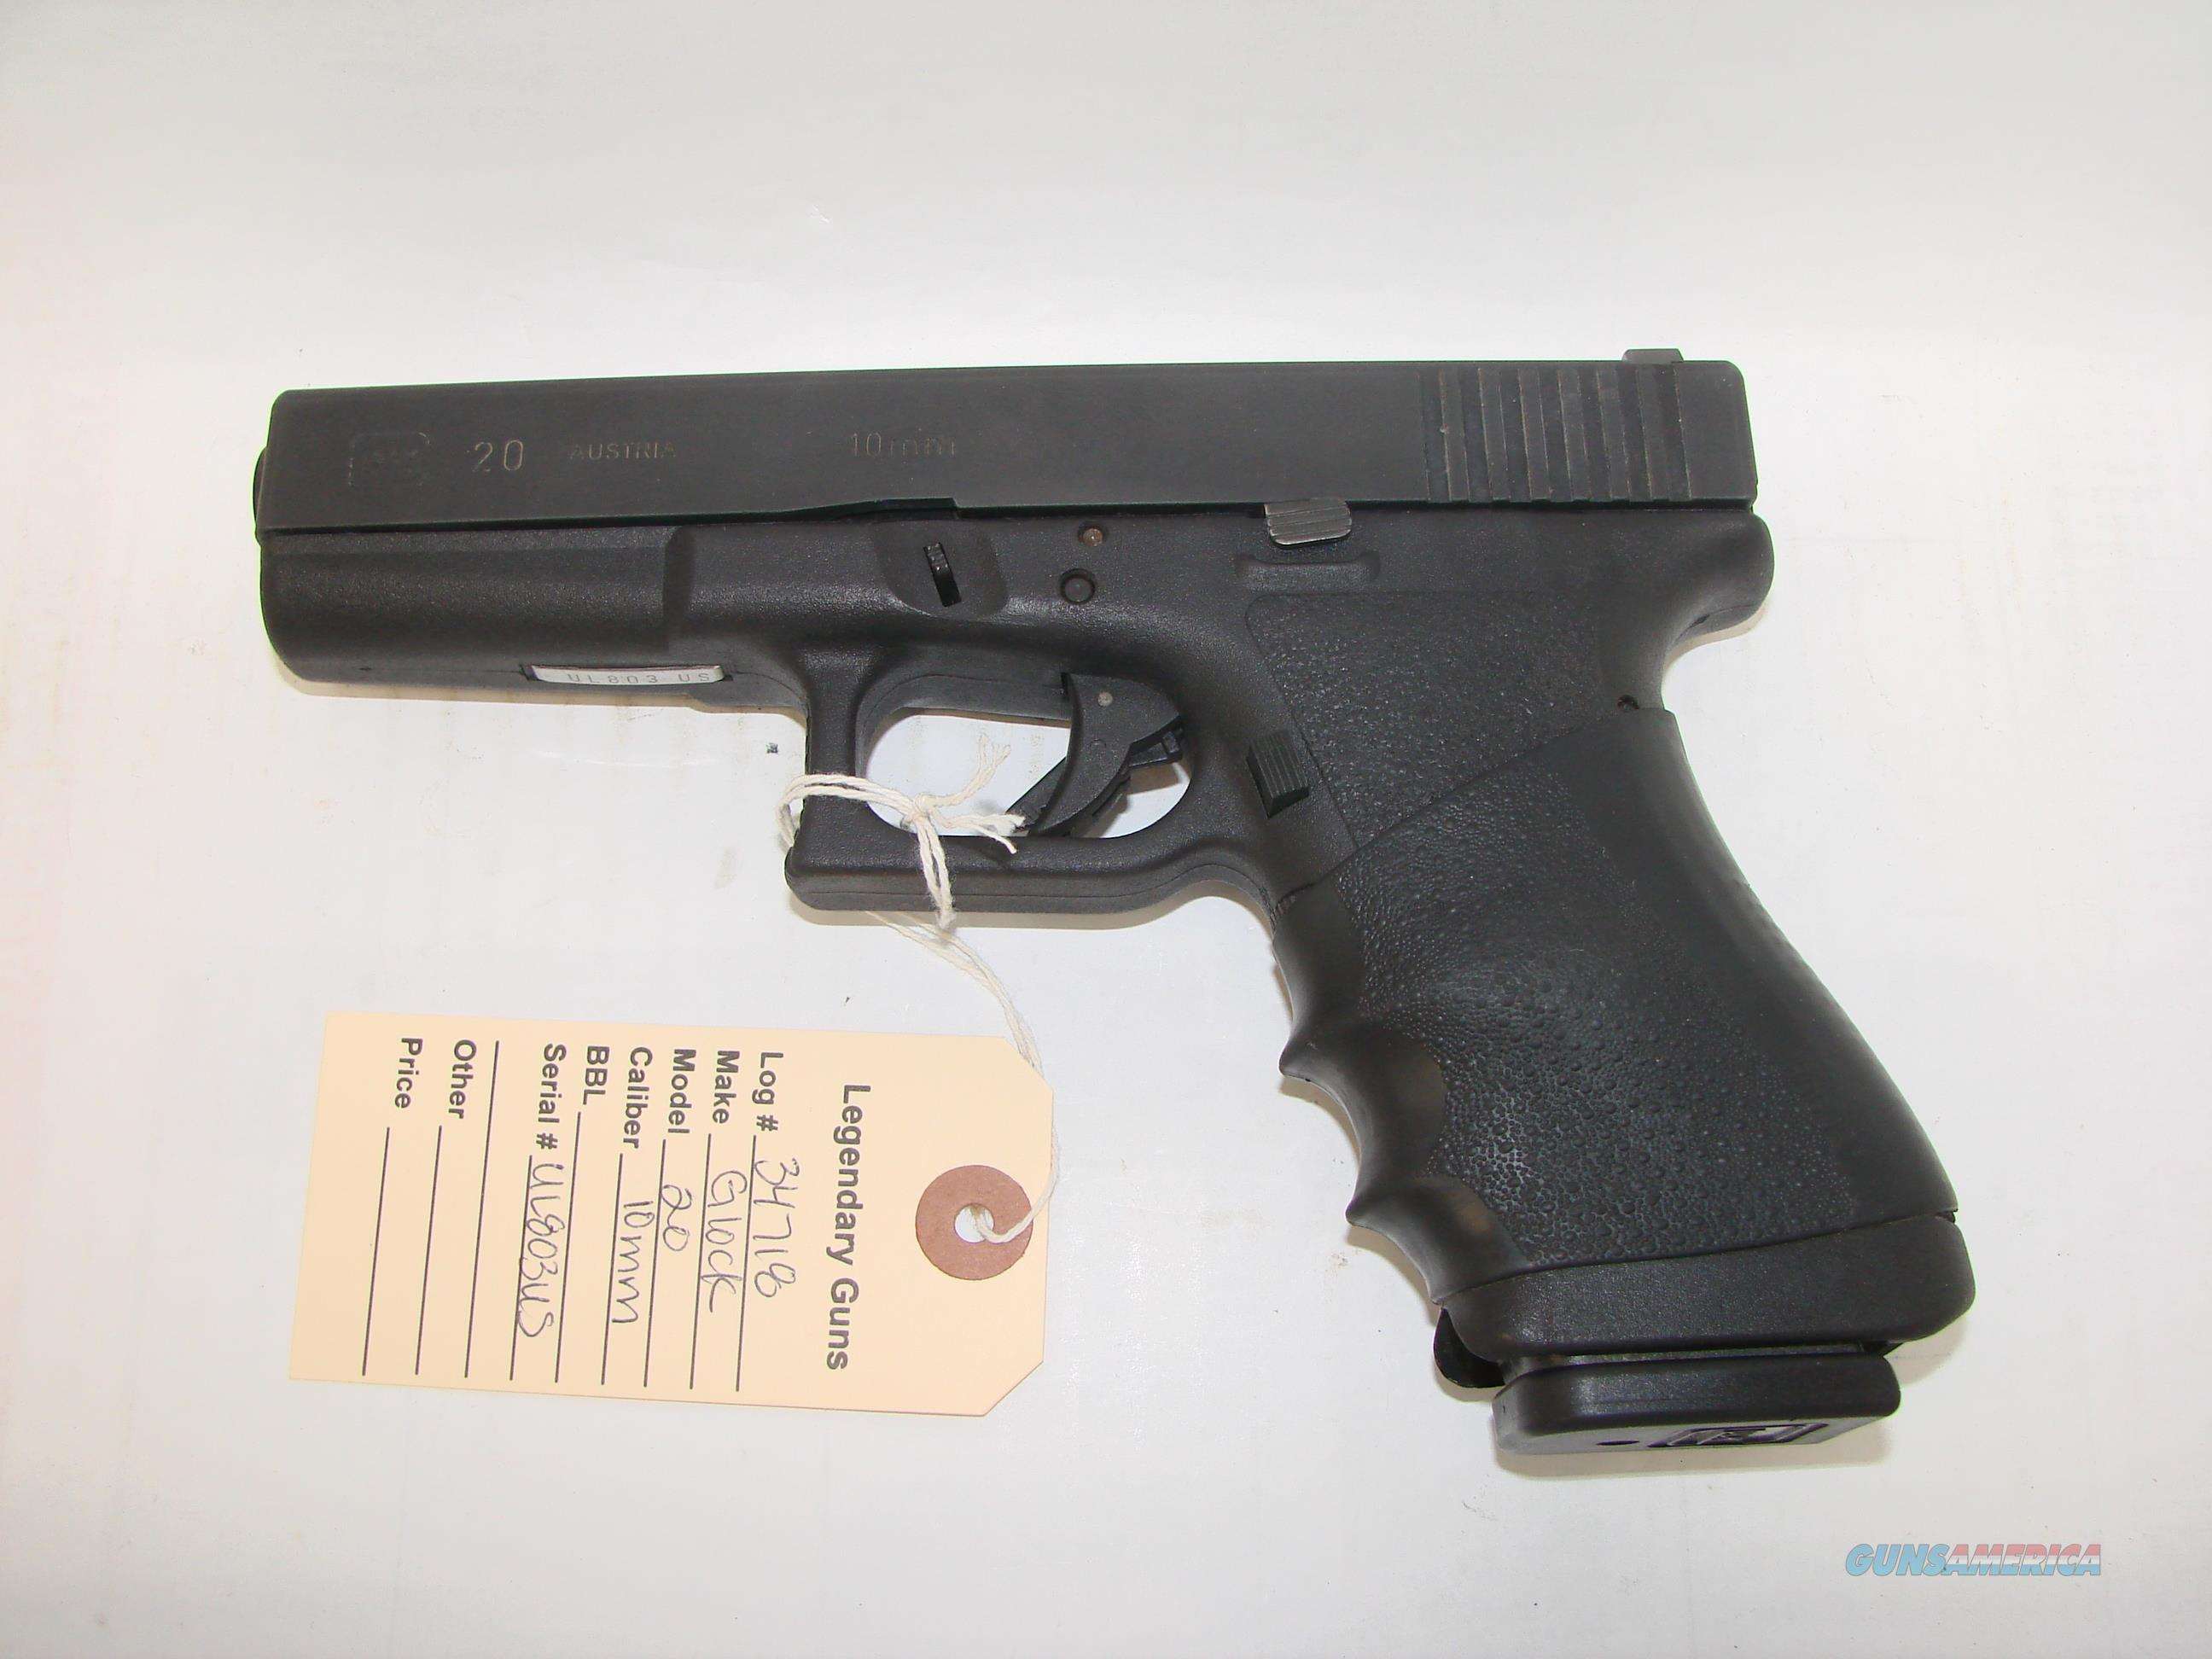 Glock 20 Gen 2  Guns > Pistols > Glock Pistols > 20/21